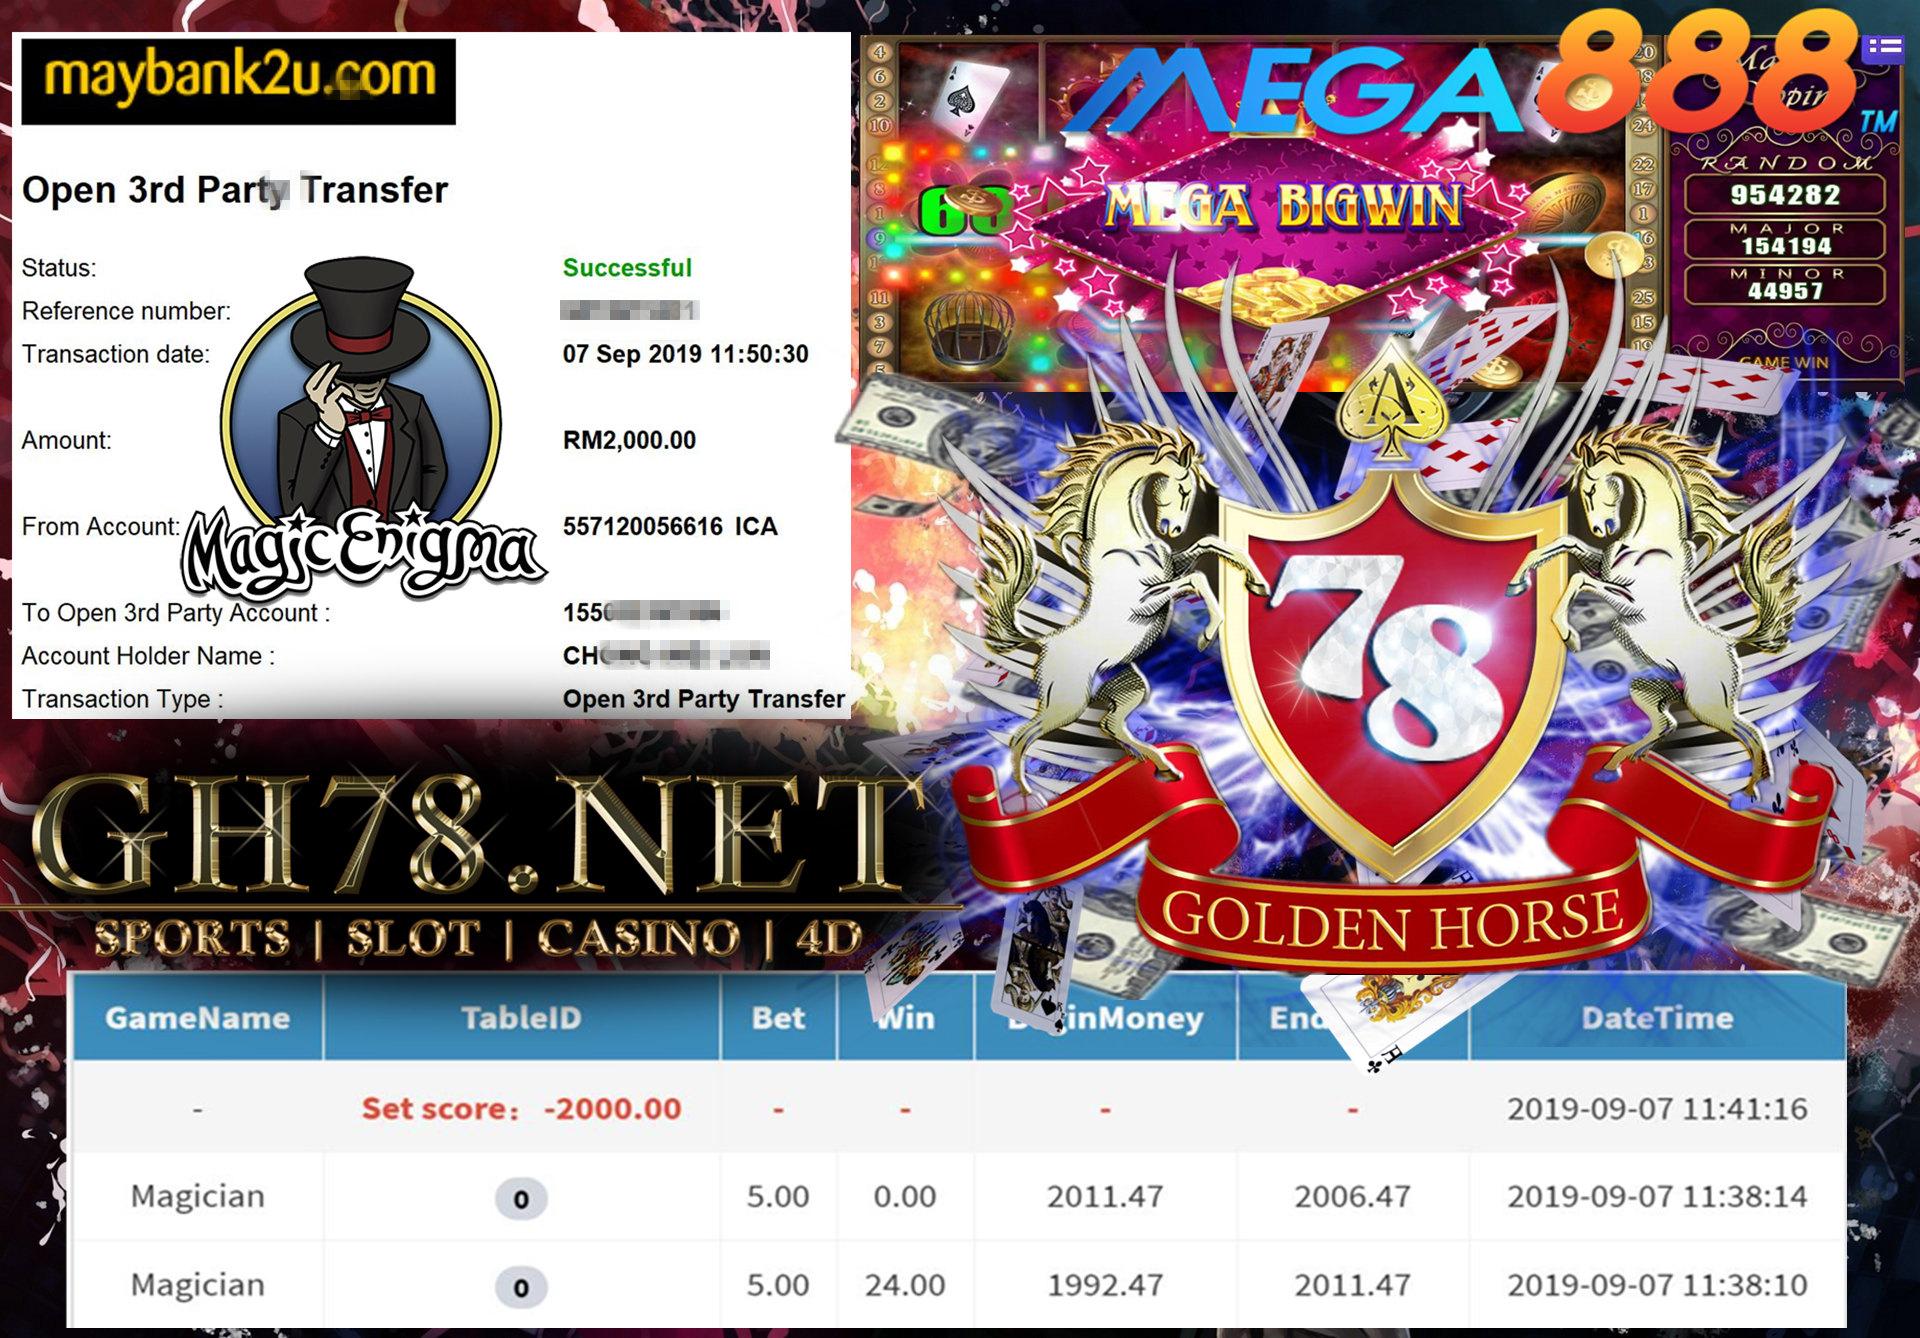 MAIN GAME MEGA888 FT.MAGICIAN MINTA OUT RM2,000